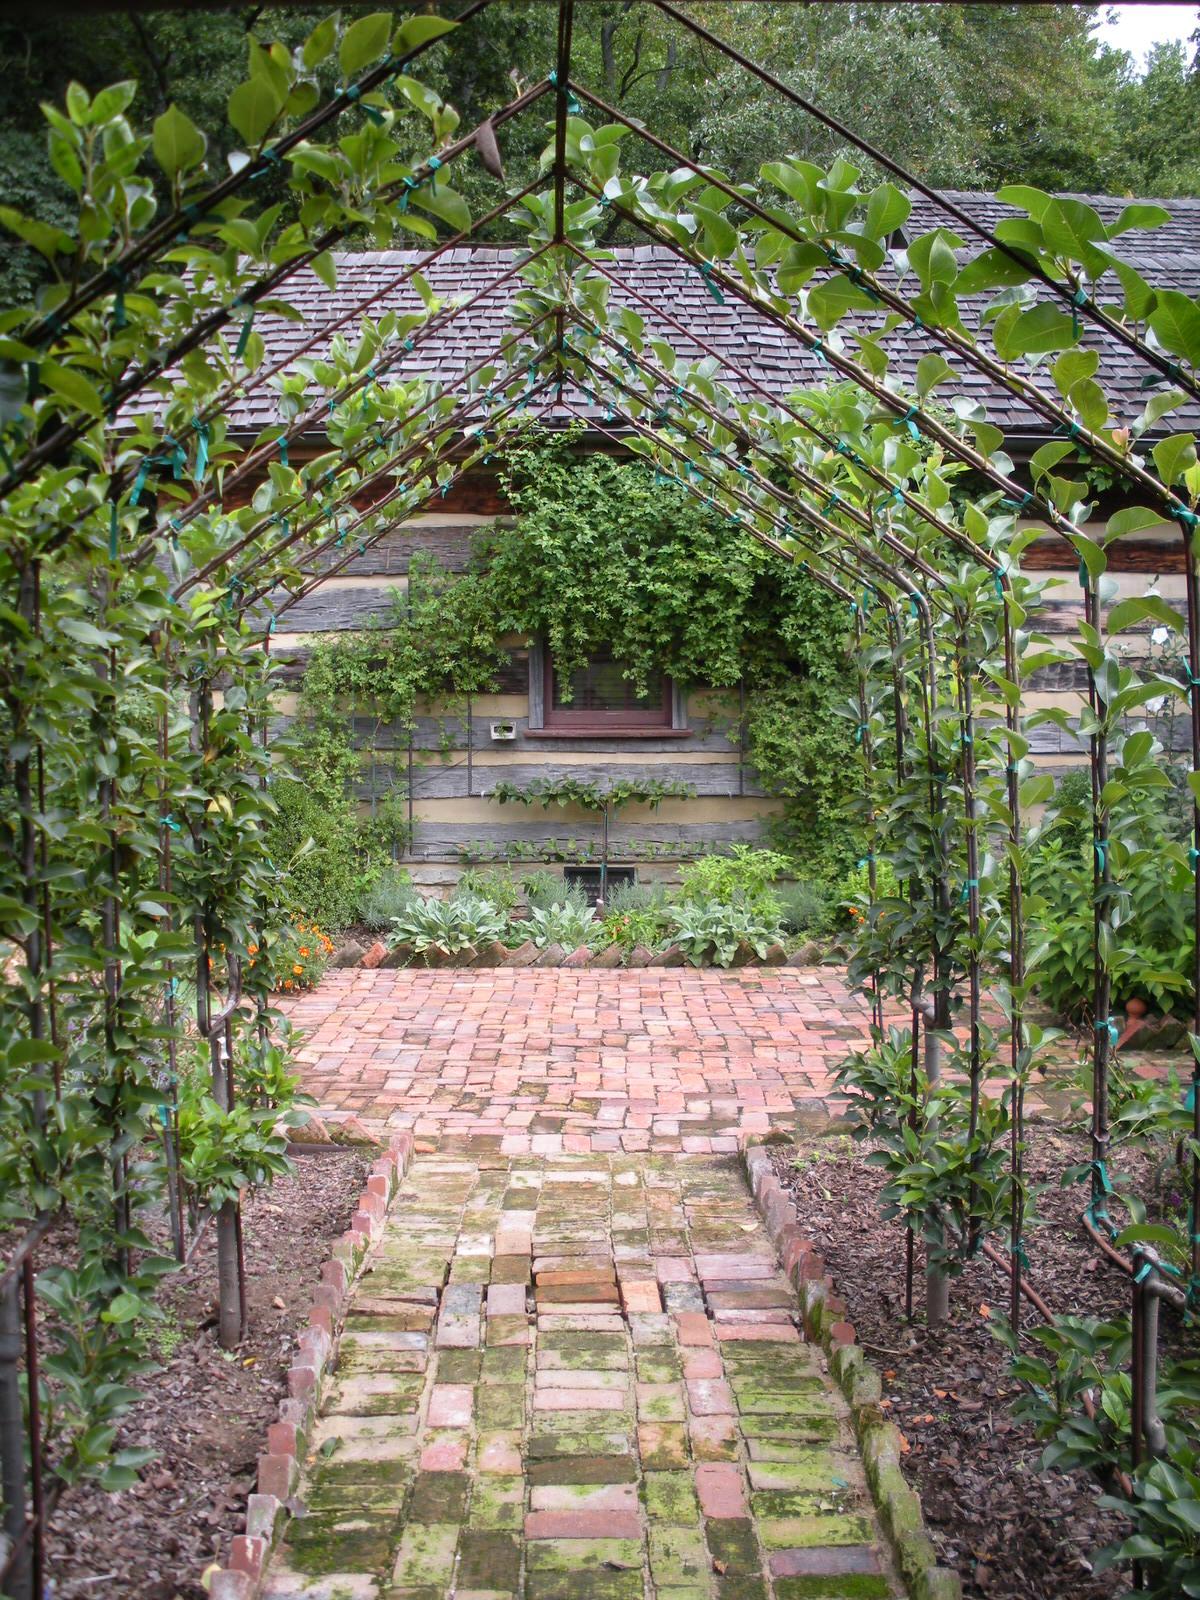 Justin Stelter Landscape Gardening - Country Garden - Justin Stelter Landscape Gardening - Country Garden2886248453_80e769320b_o.jpg